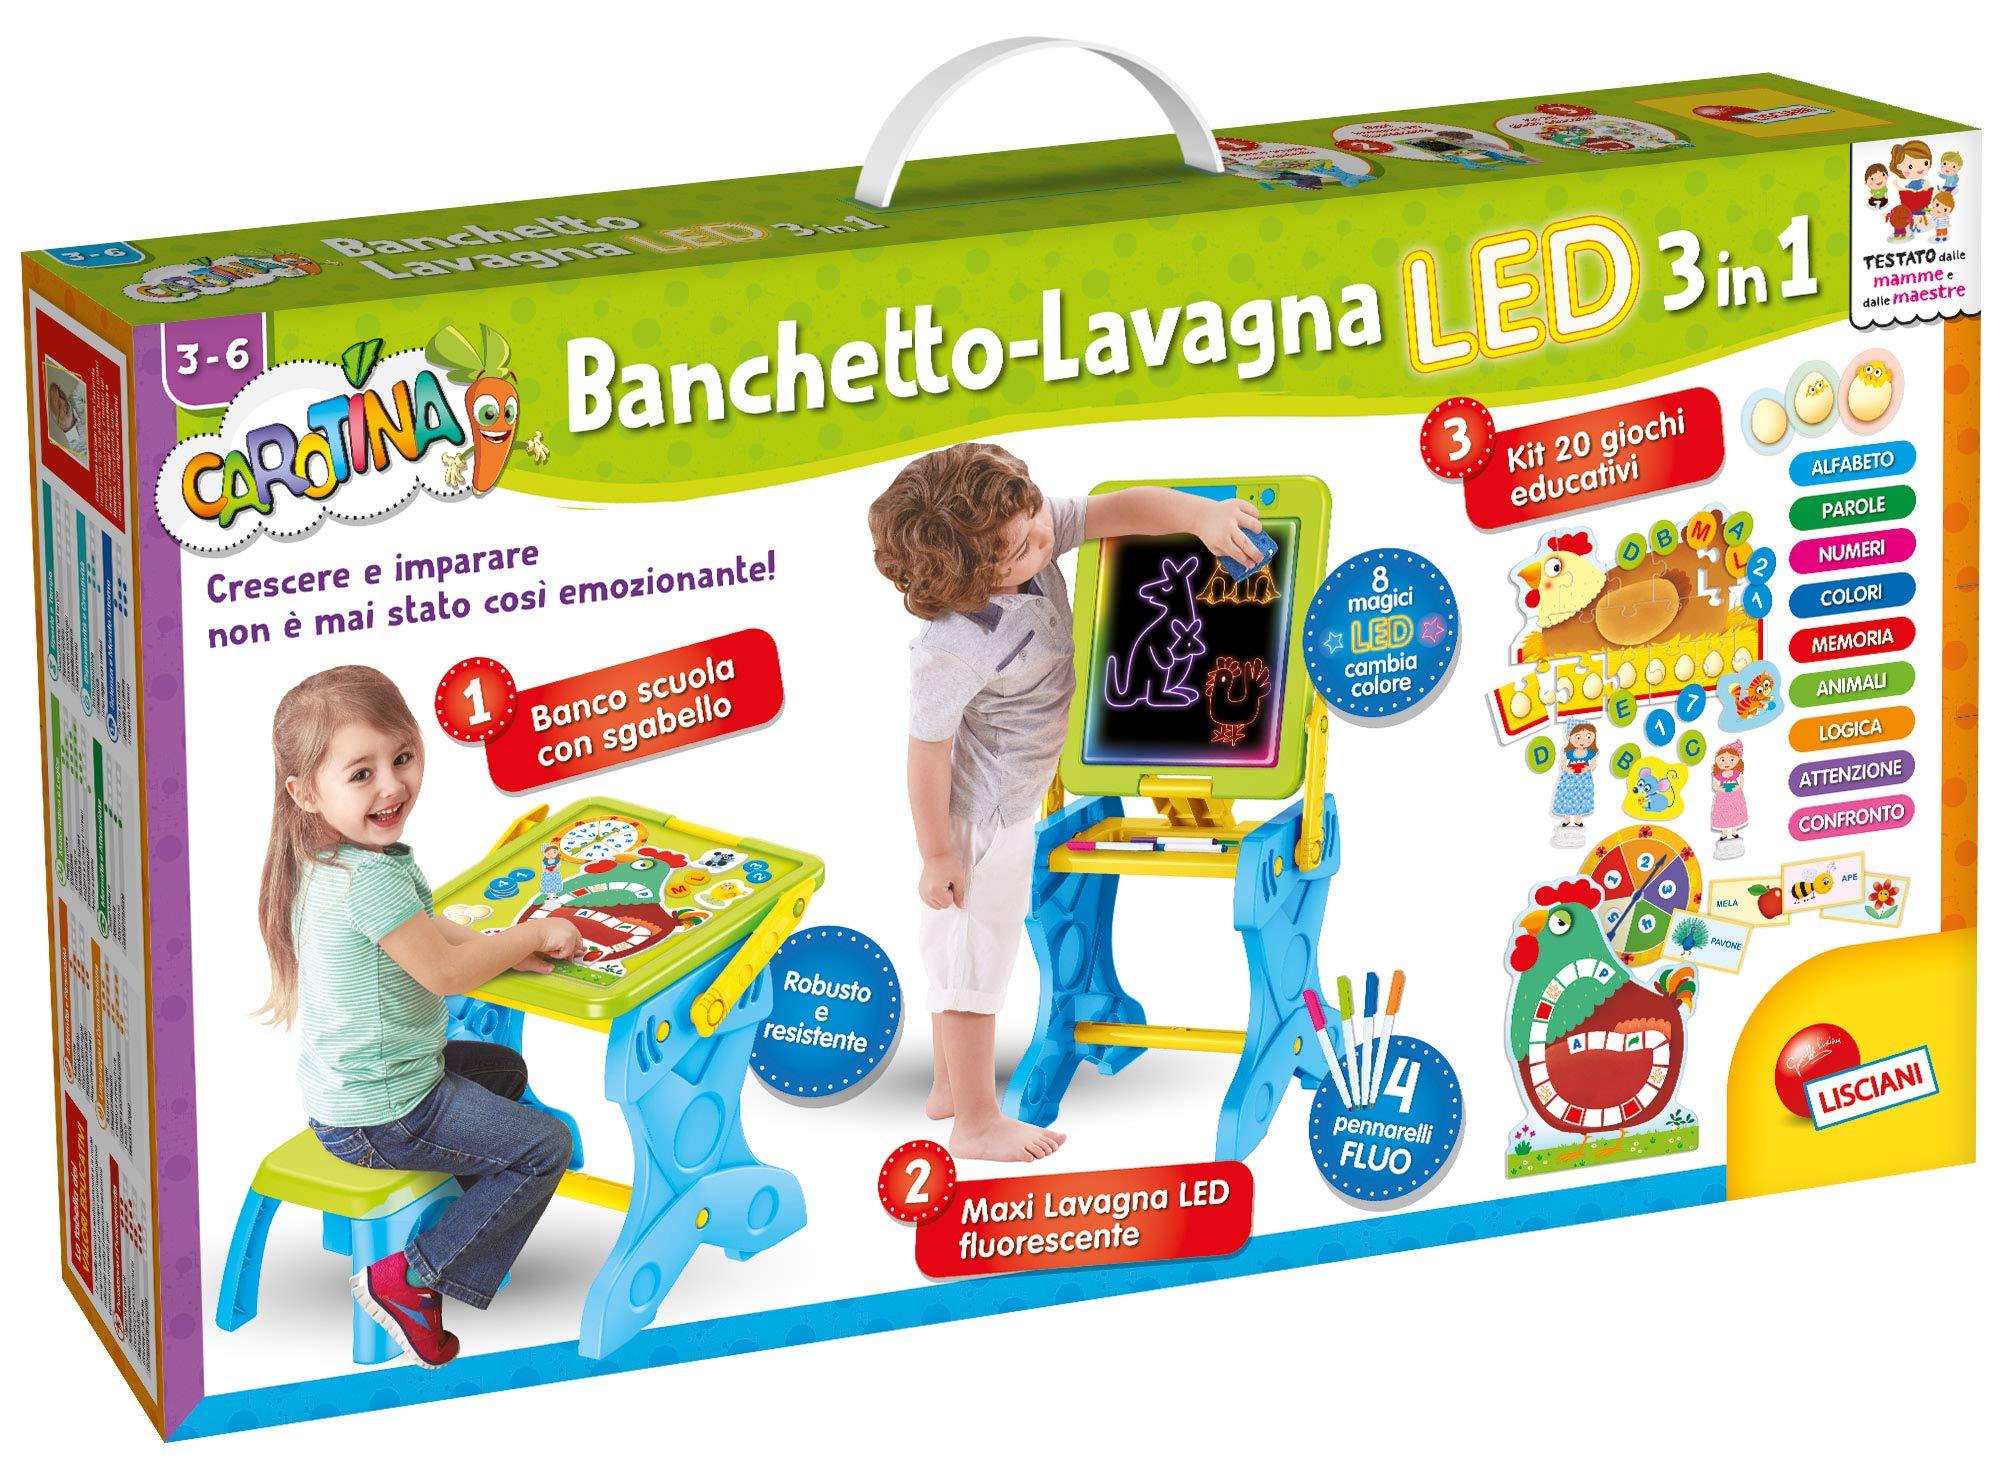 Lisciani Games carotina Banquet LED Gaming, and Imparo-Multicoloured, 68616